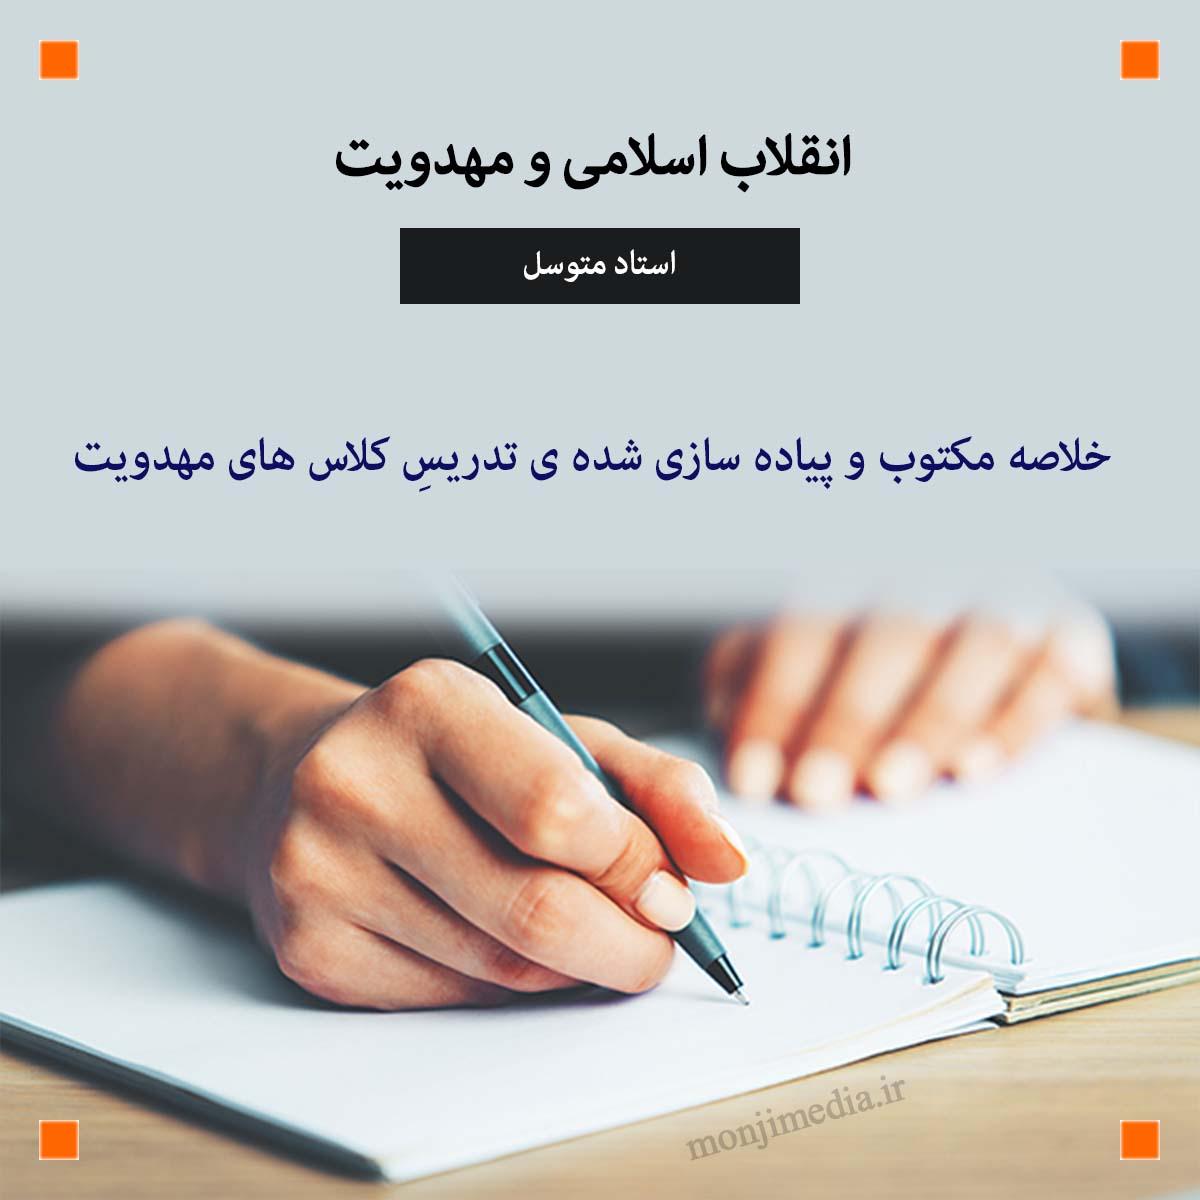 "عکس- خلاصه مکتوب "" انقلاب اسلامی و مهدویت "" استاد متوسل"